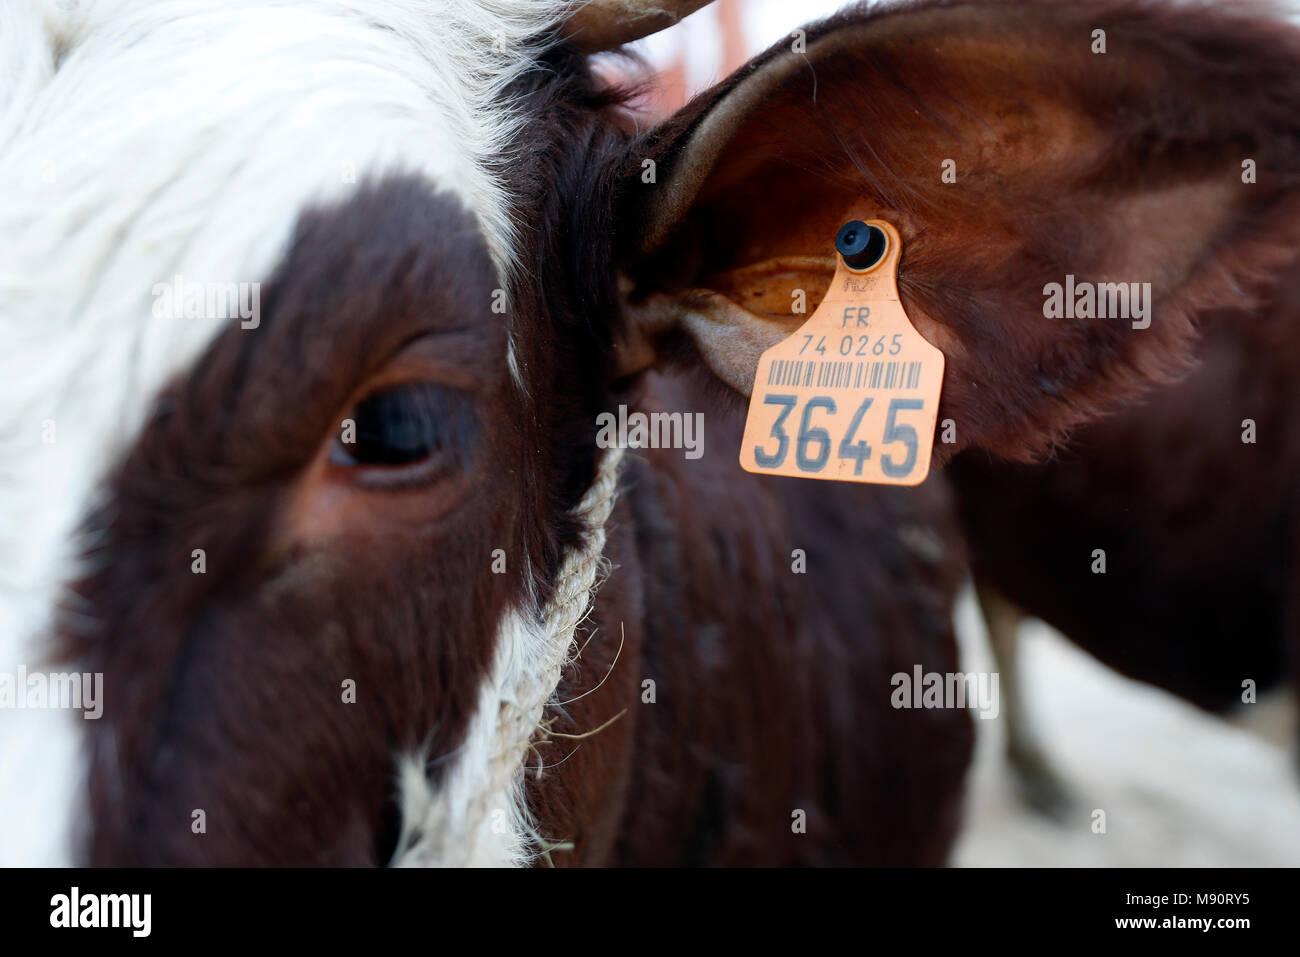 The agriculture fair (Comice Agricole) of Saint-Gervais-les-Bains. - Stock Image